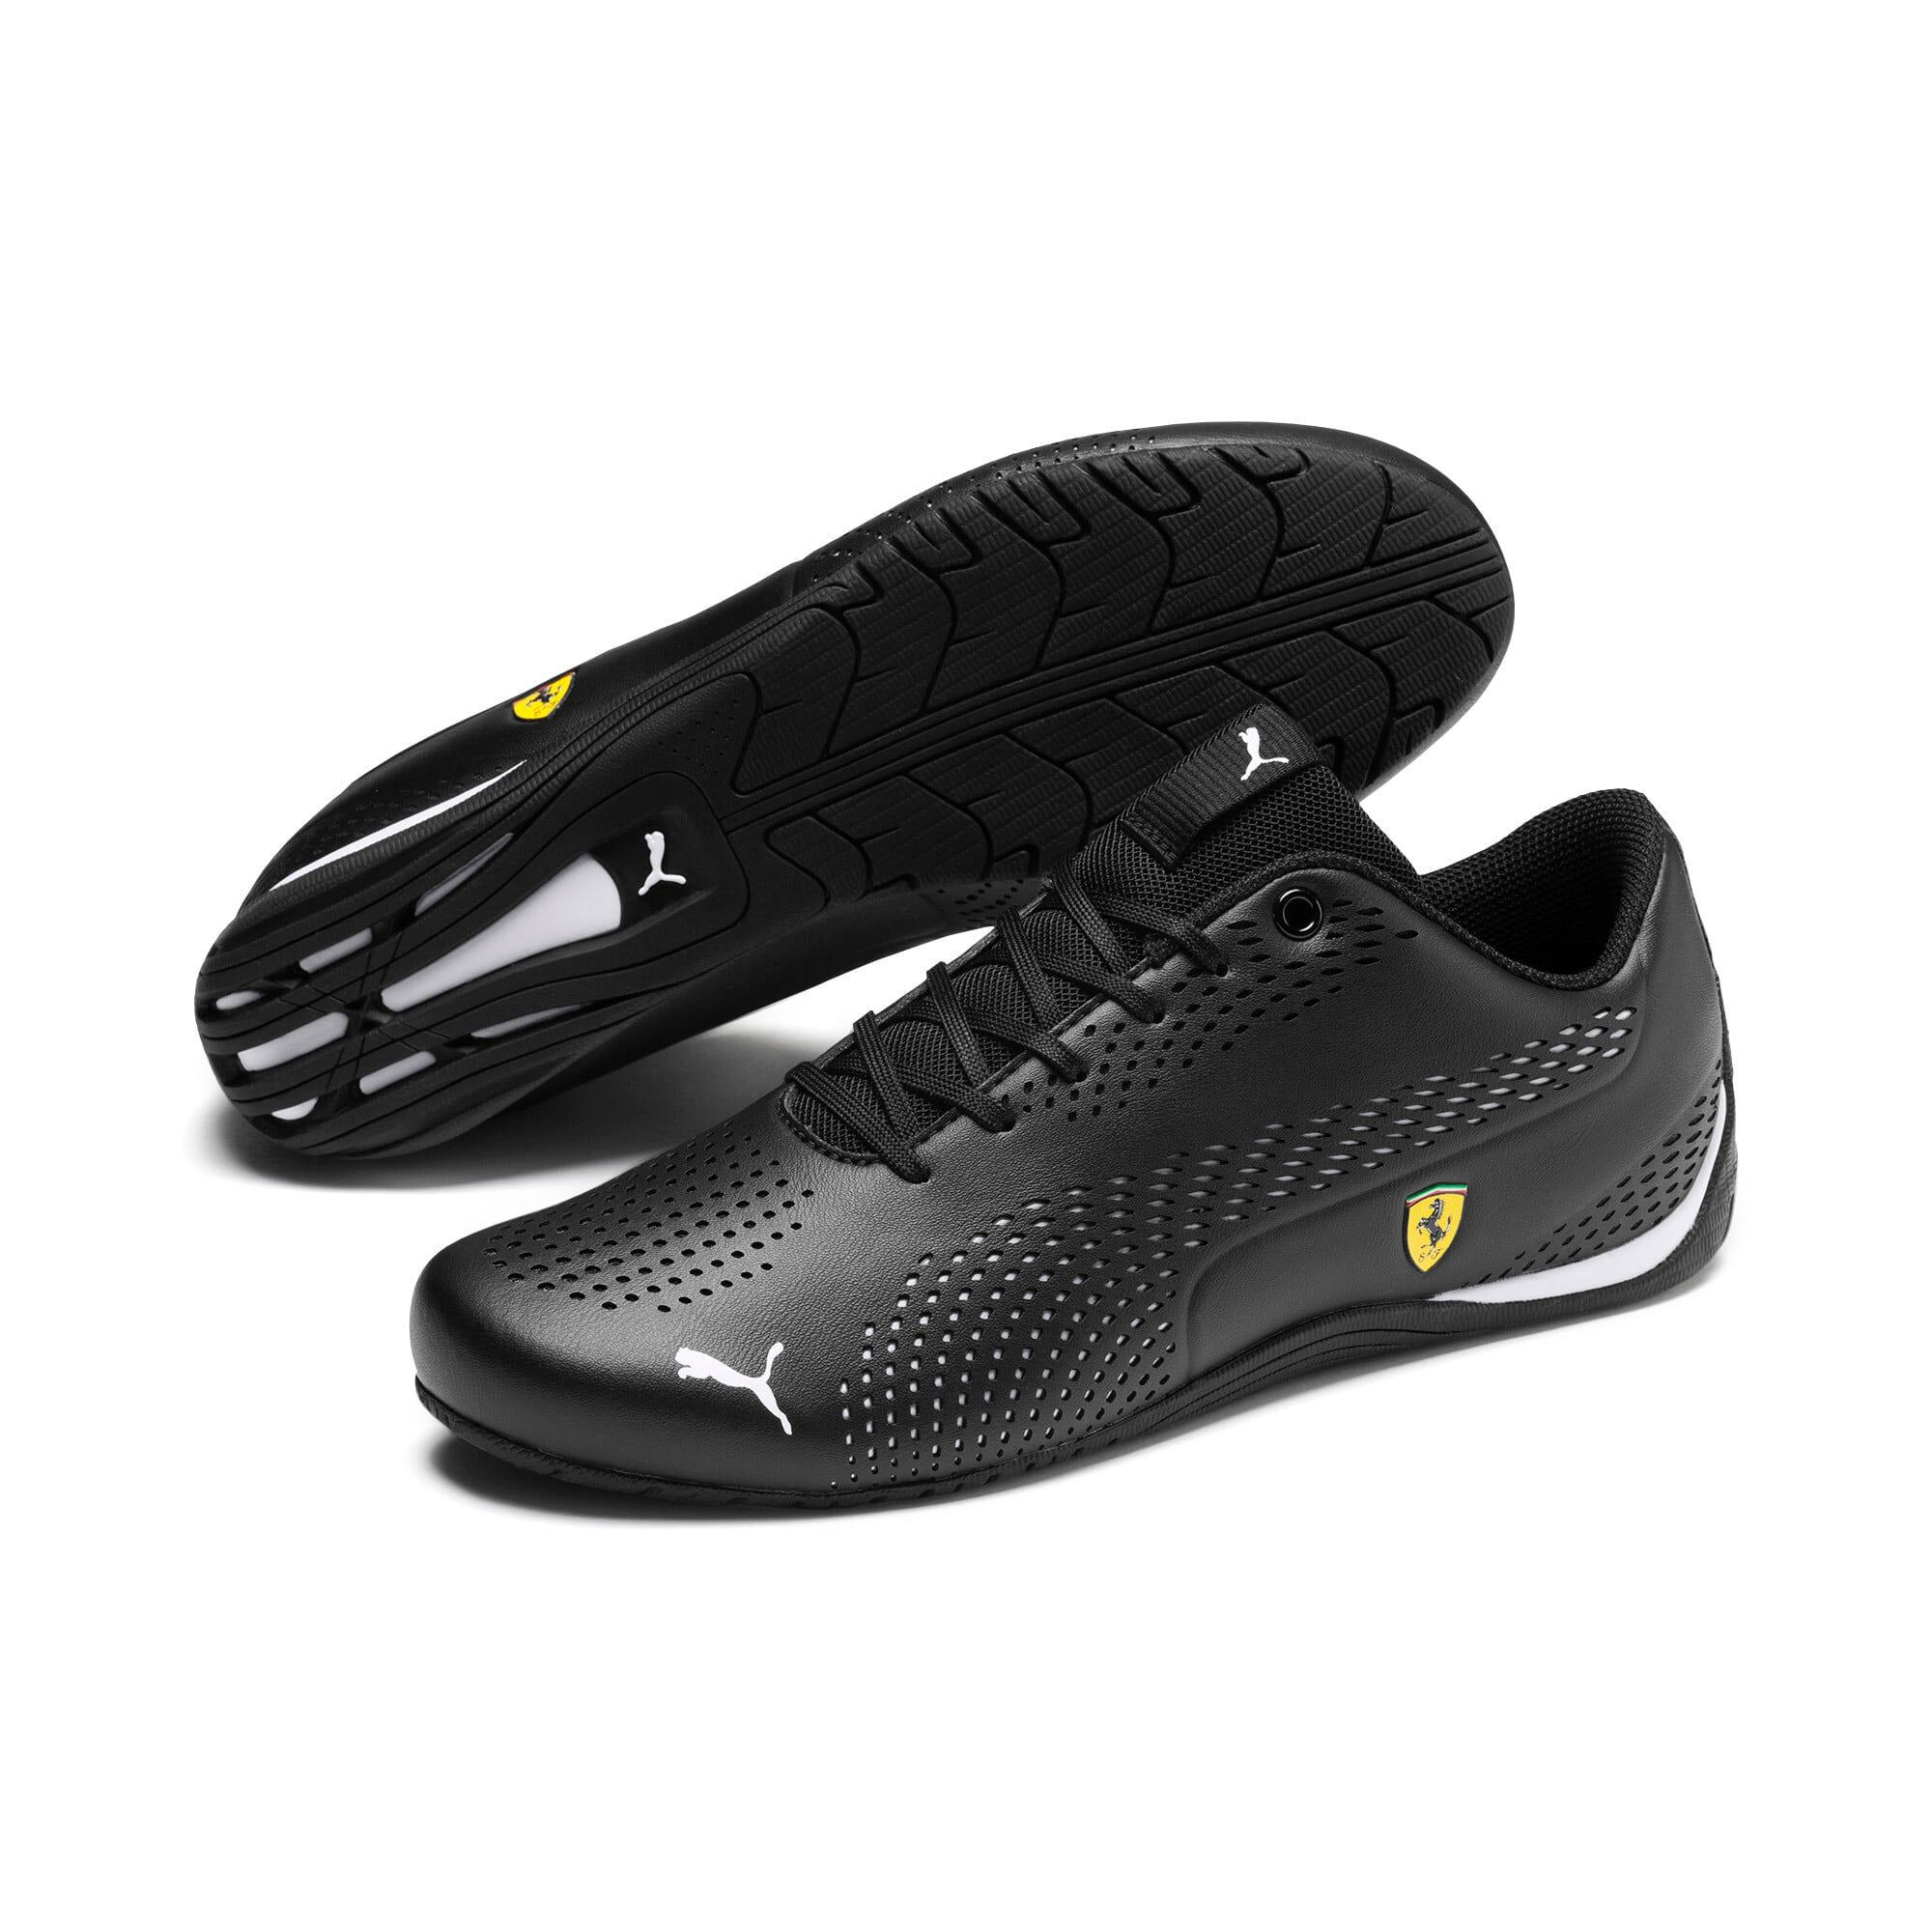 Thumbnail 3 of Scuderia Ferrari Drift Cat 5 Ultra II Shoes, Puma Black-Puma White, medium